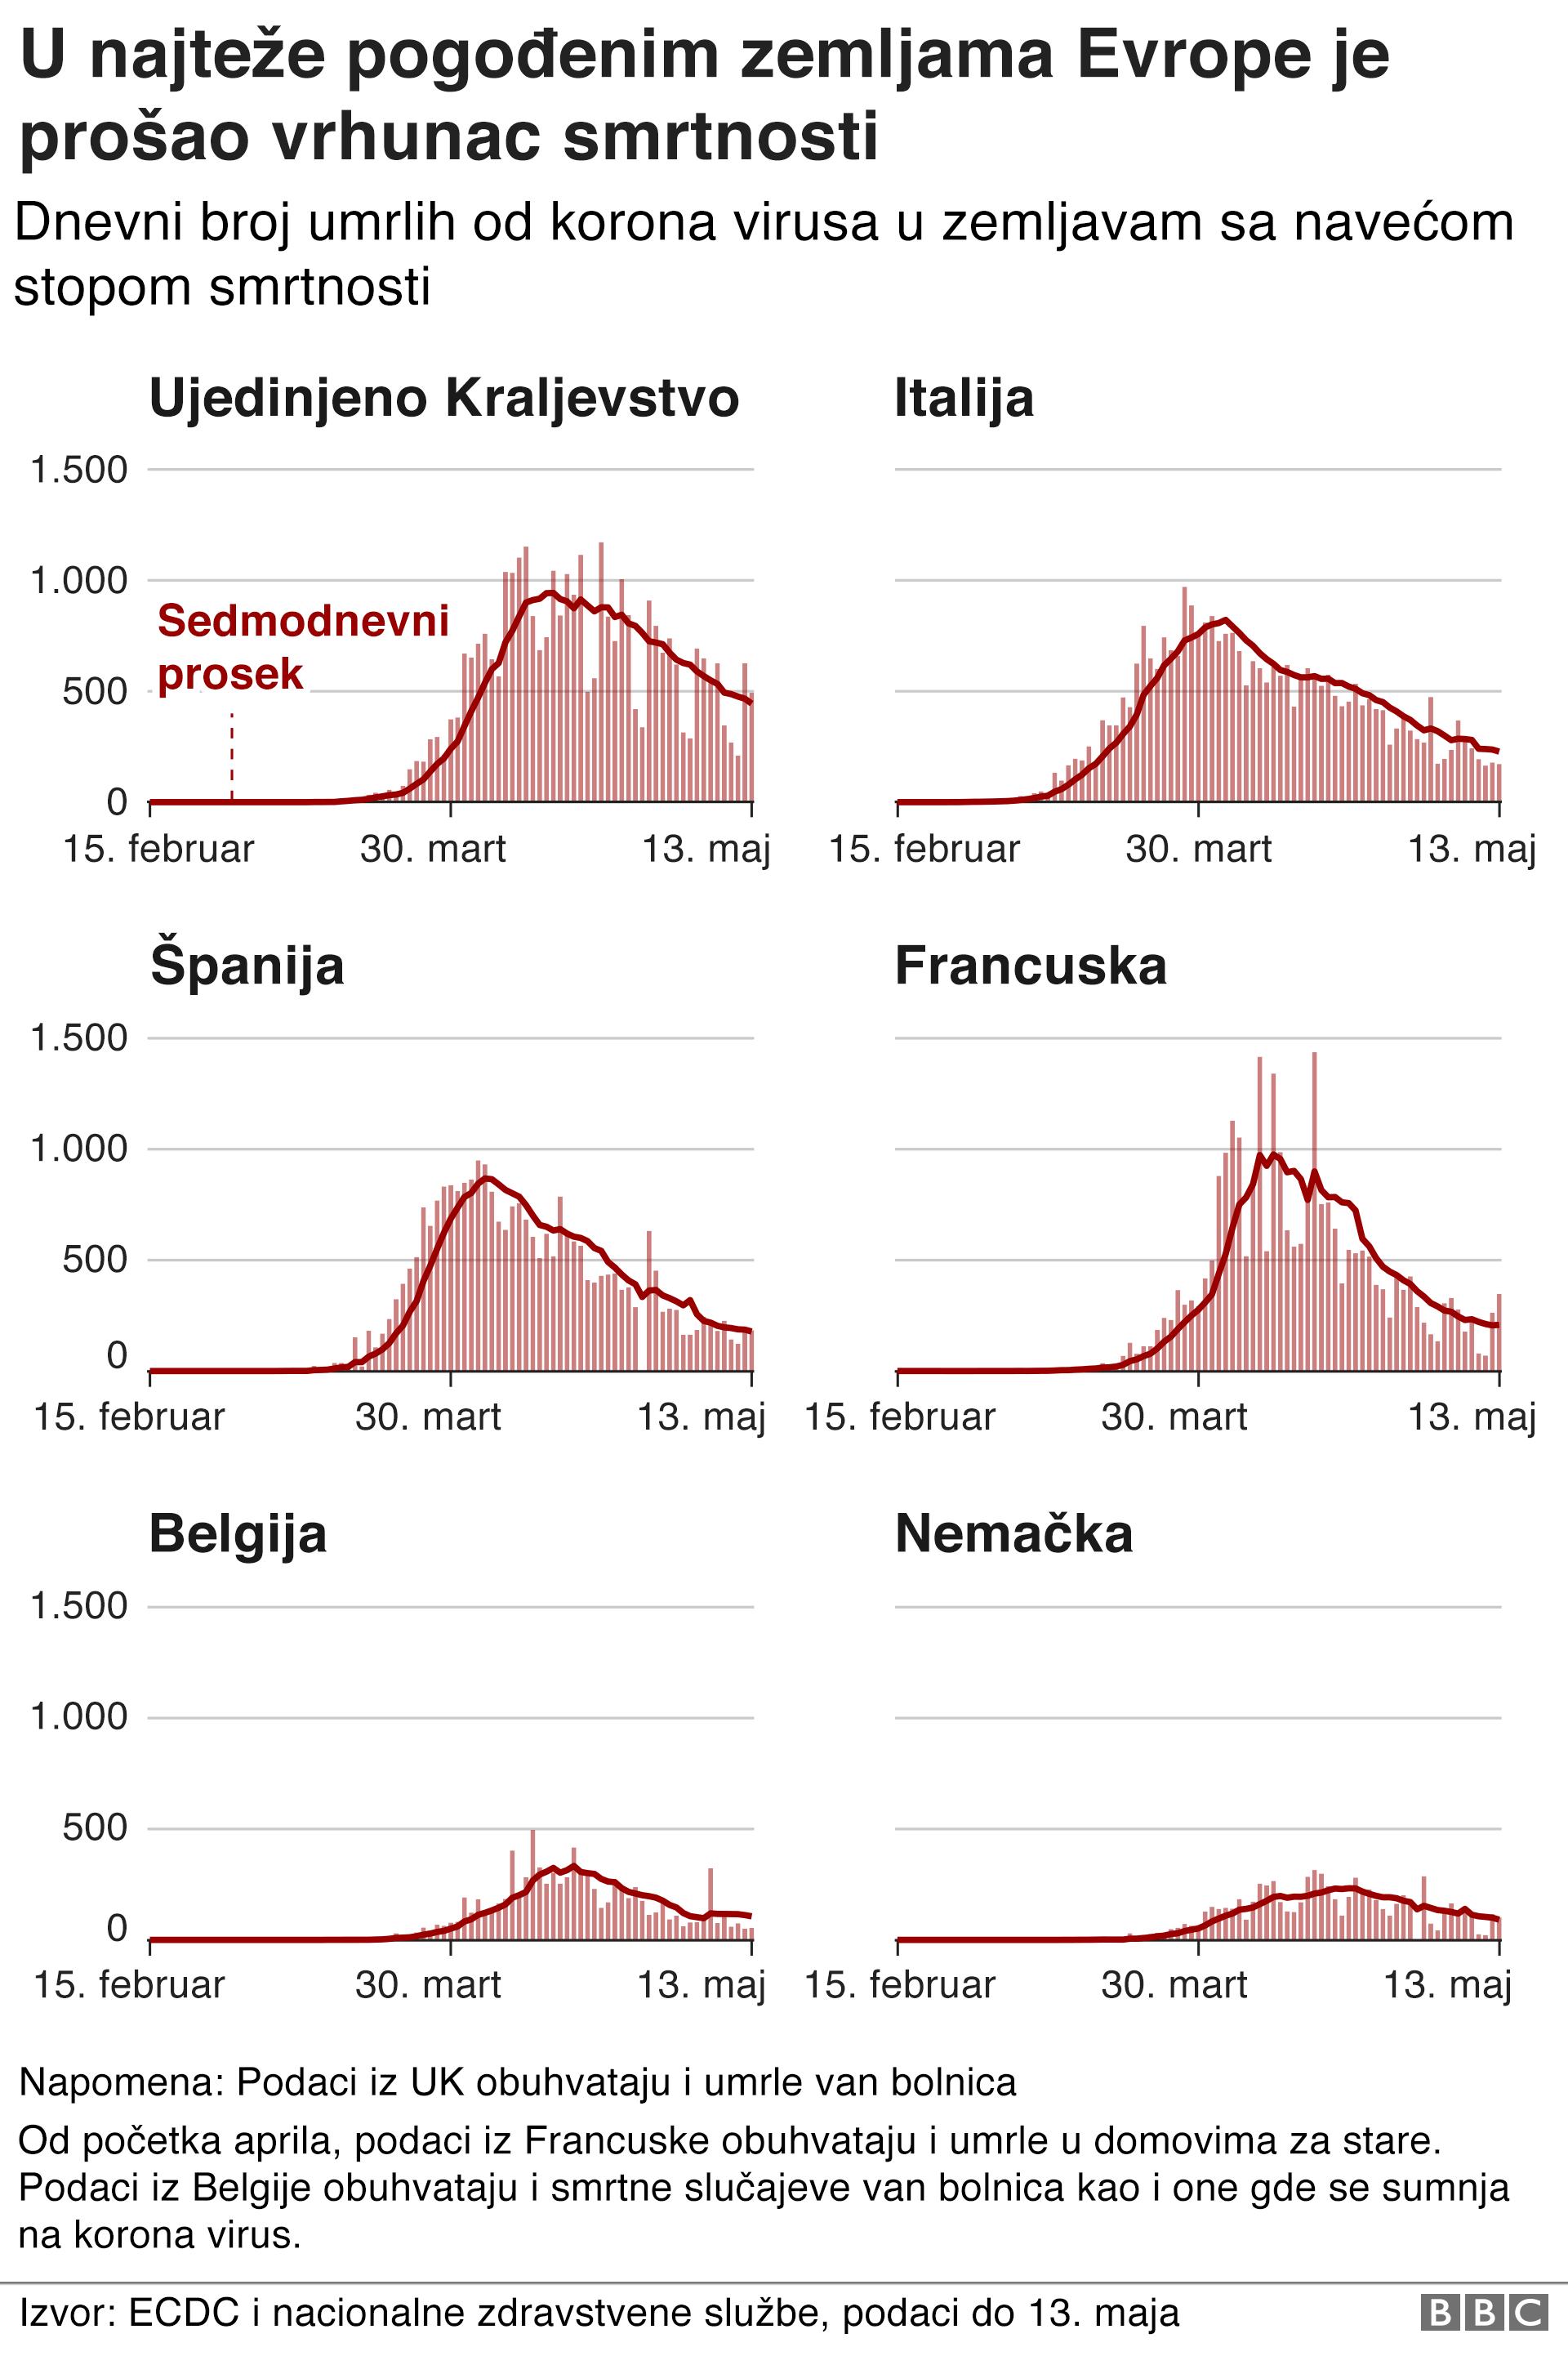 vrhunac smrtnosti u evropi 14. maj